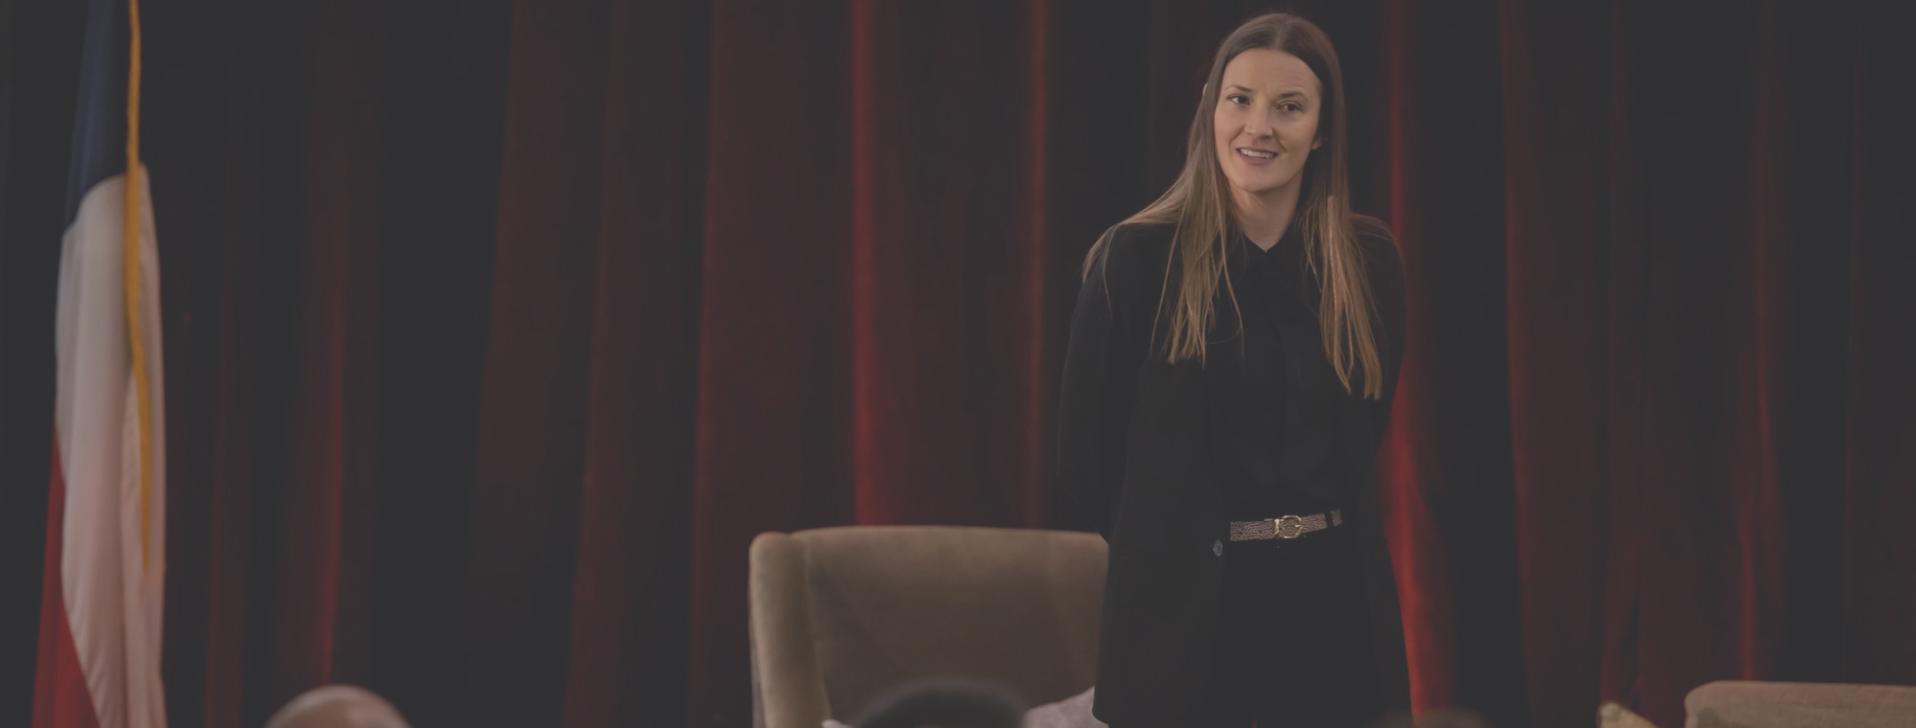 Hilary Corna partnership with Fierce Conversations